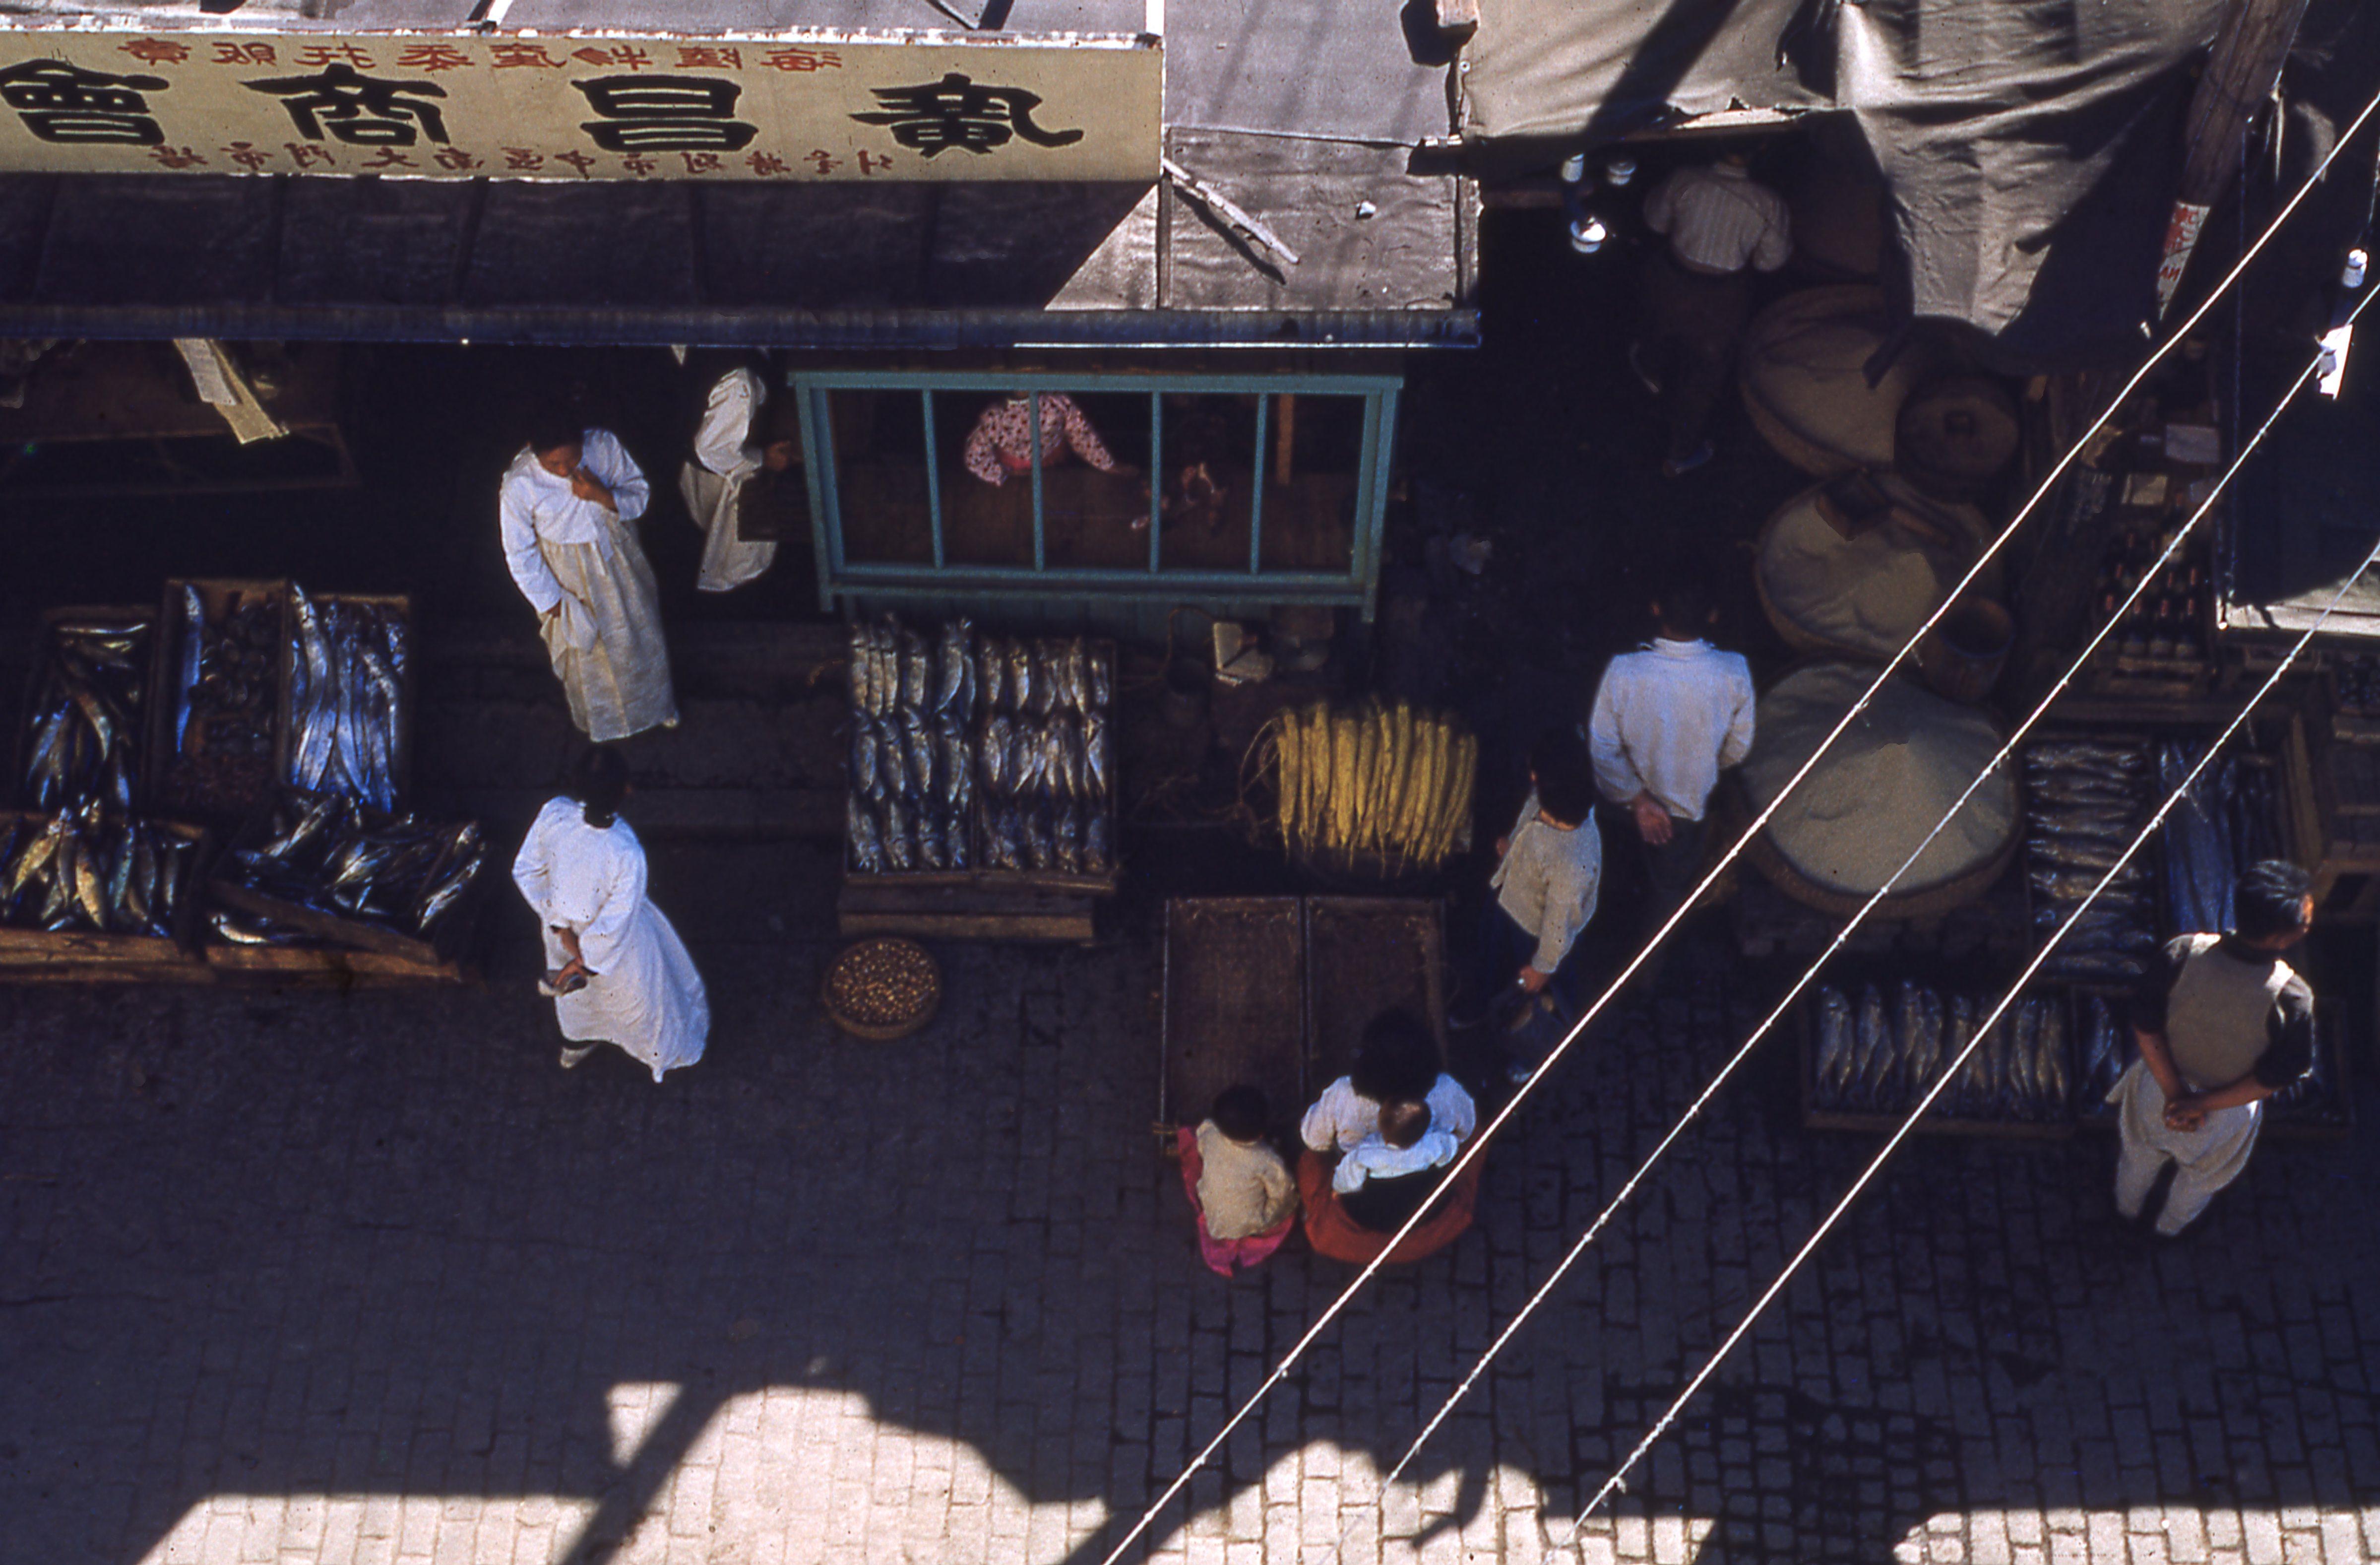 korean fish store in the 1950s